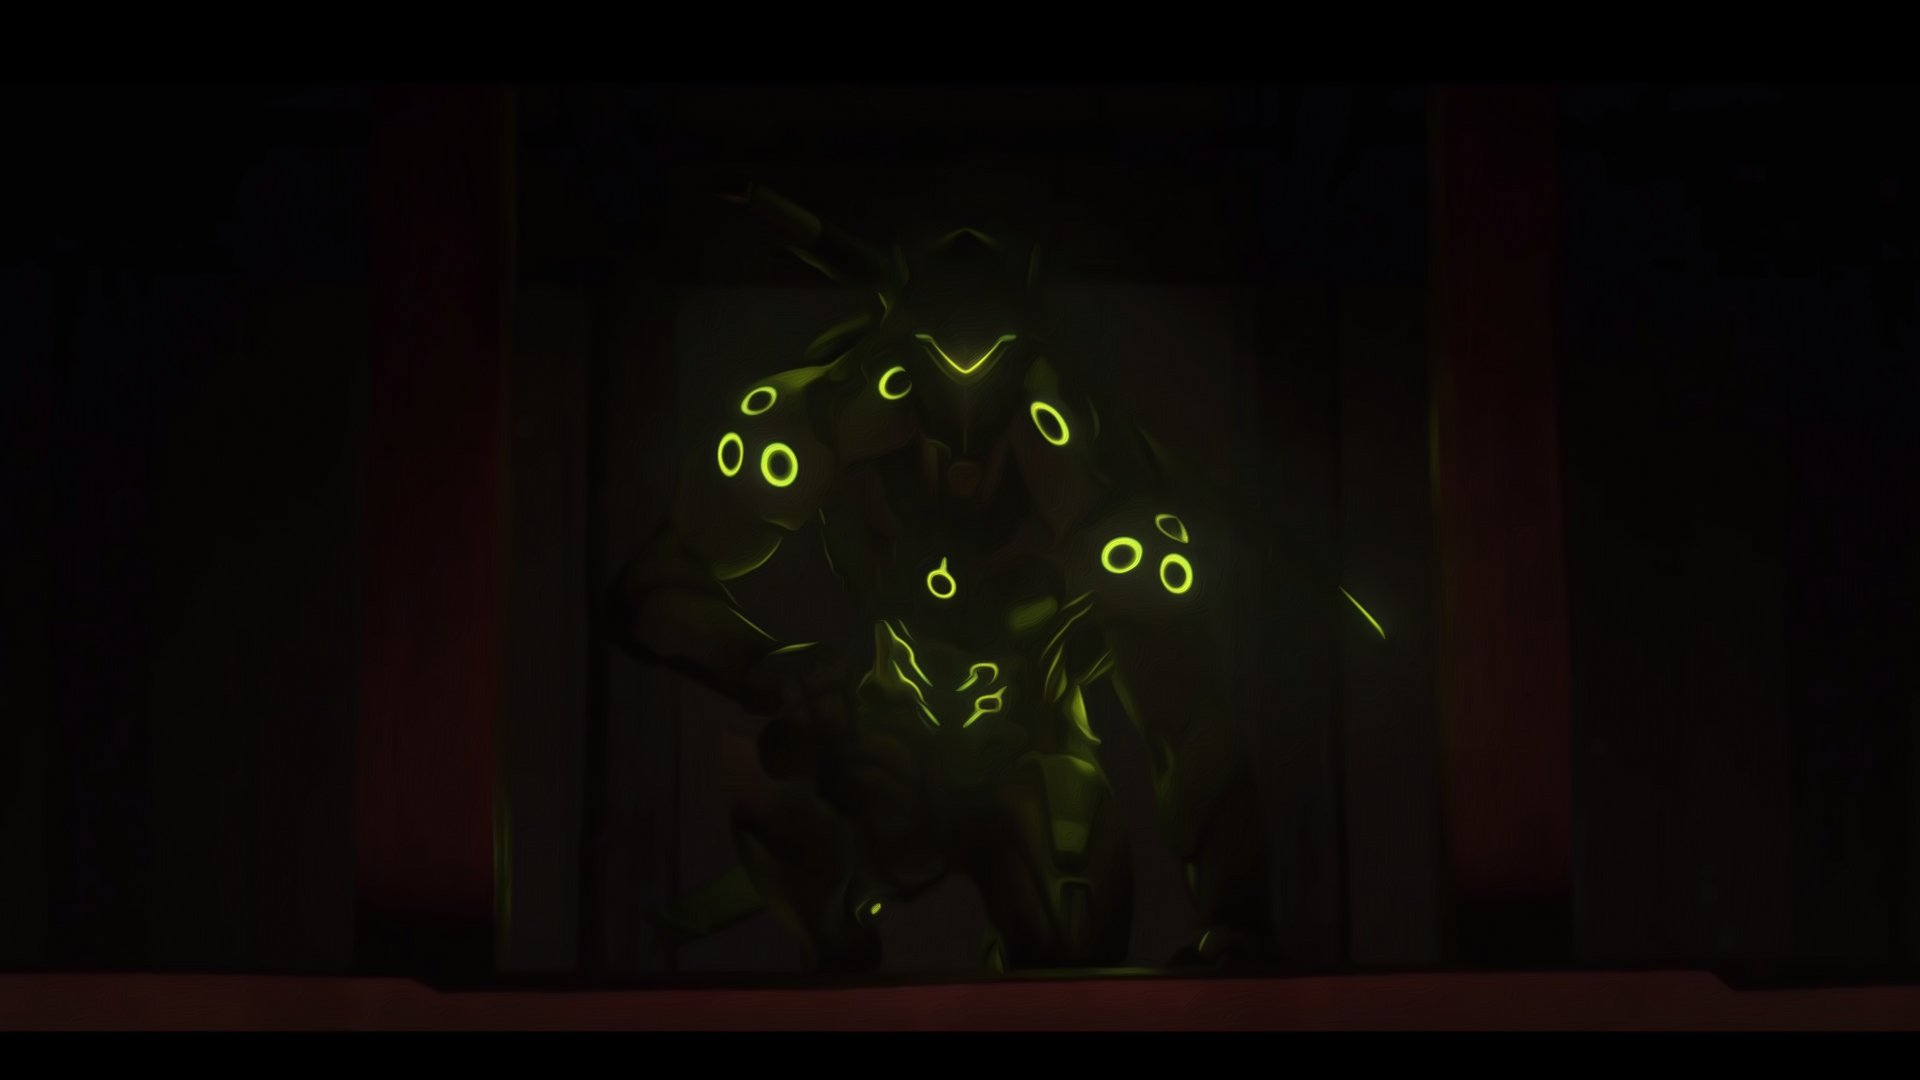 Video Game - Overwatch  Genji (Overwatch) Wallpaper